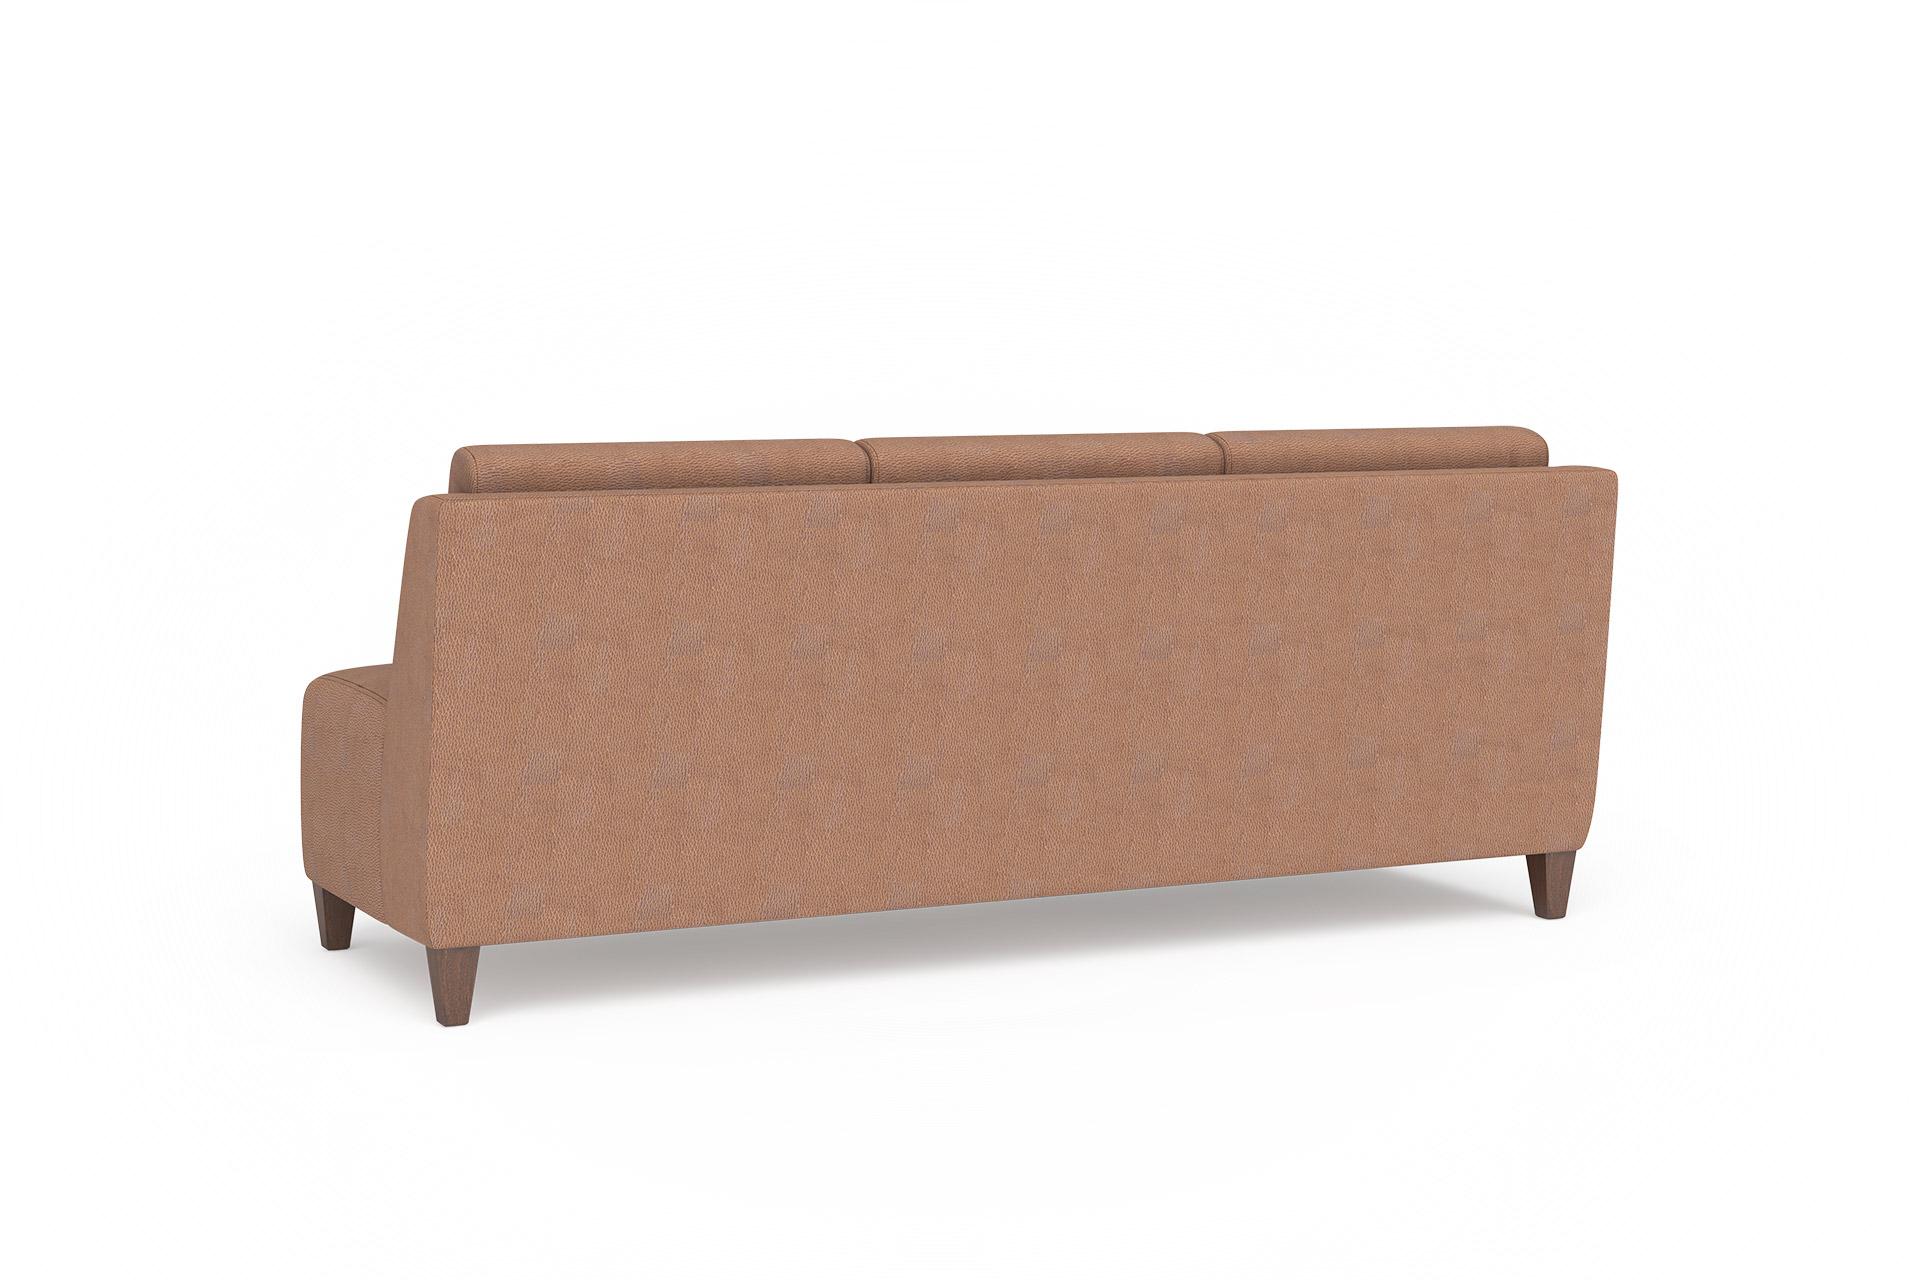 loft-and-manor-delmonico-bench-1